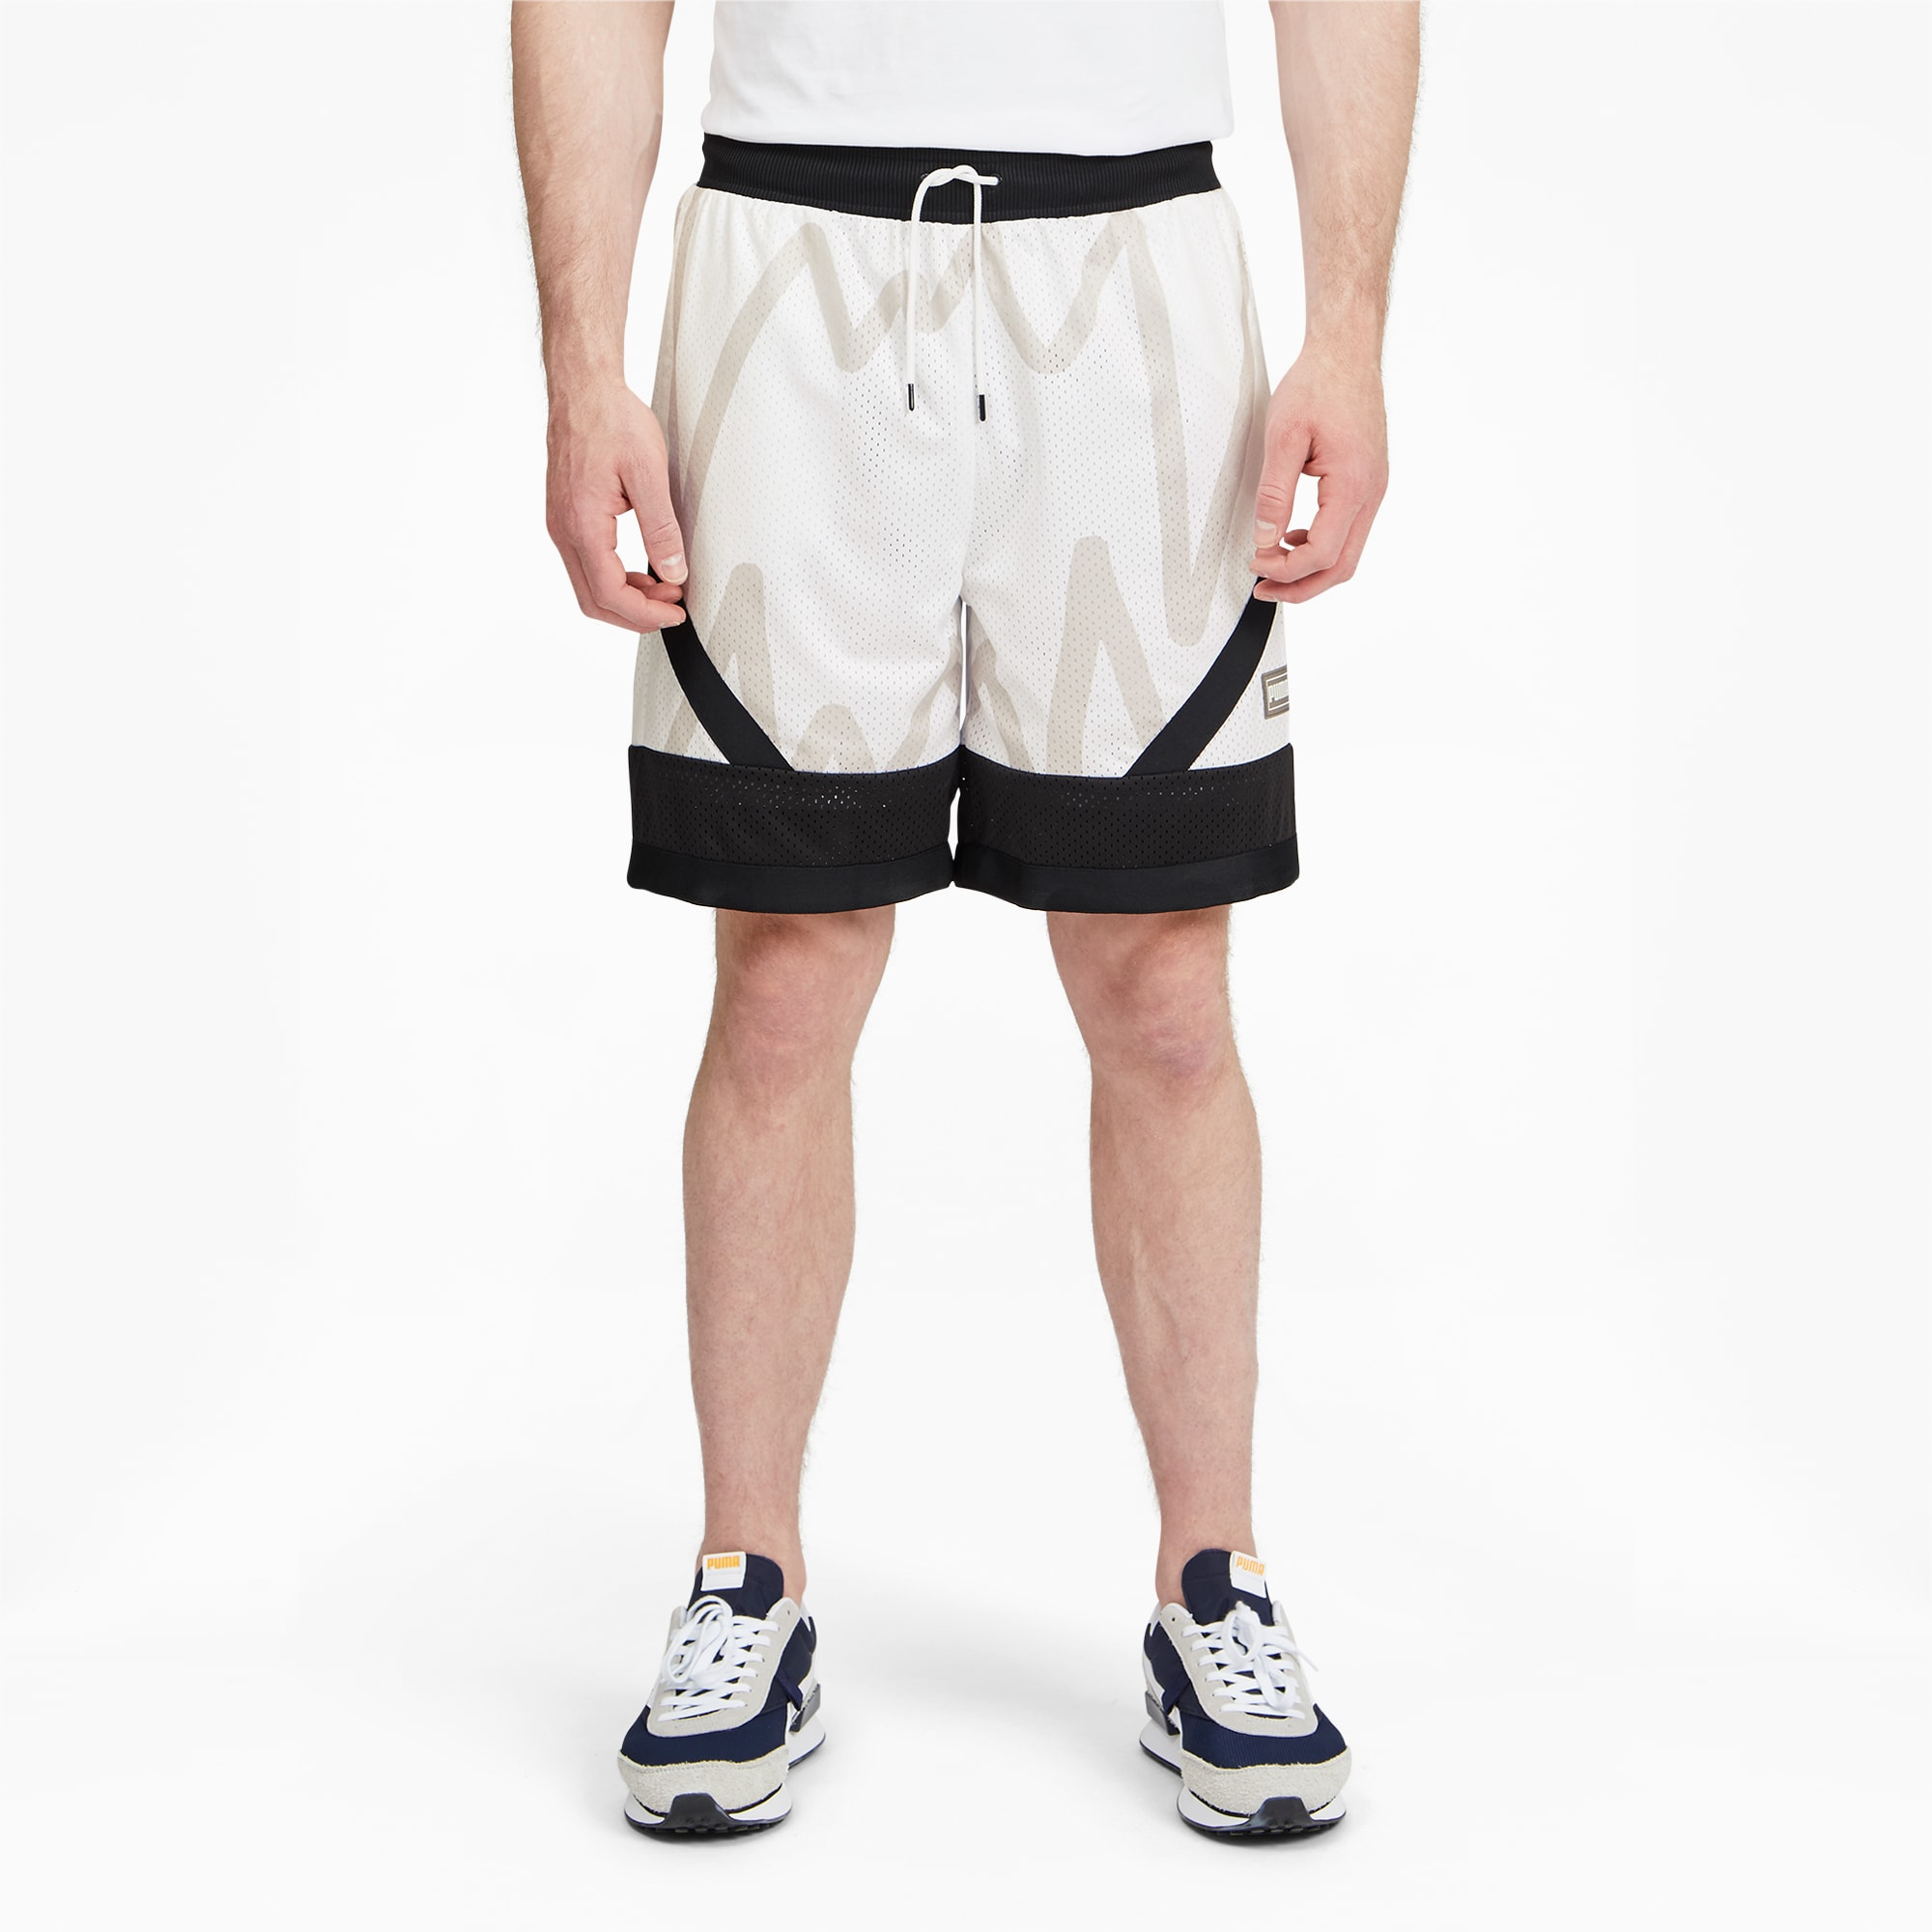 Jaws Men's Mesh Basketball Shorts